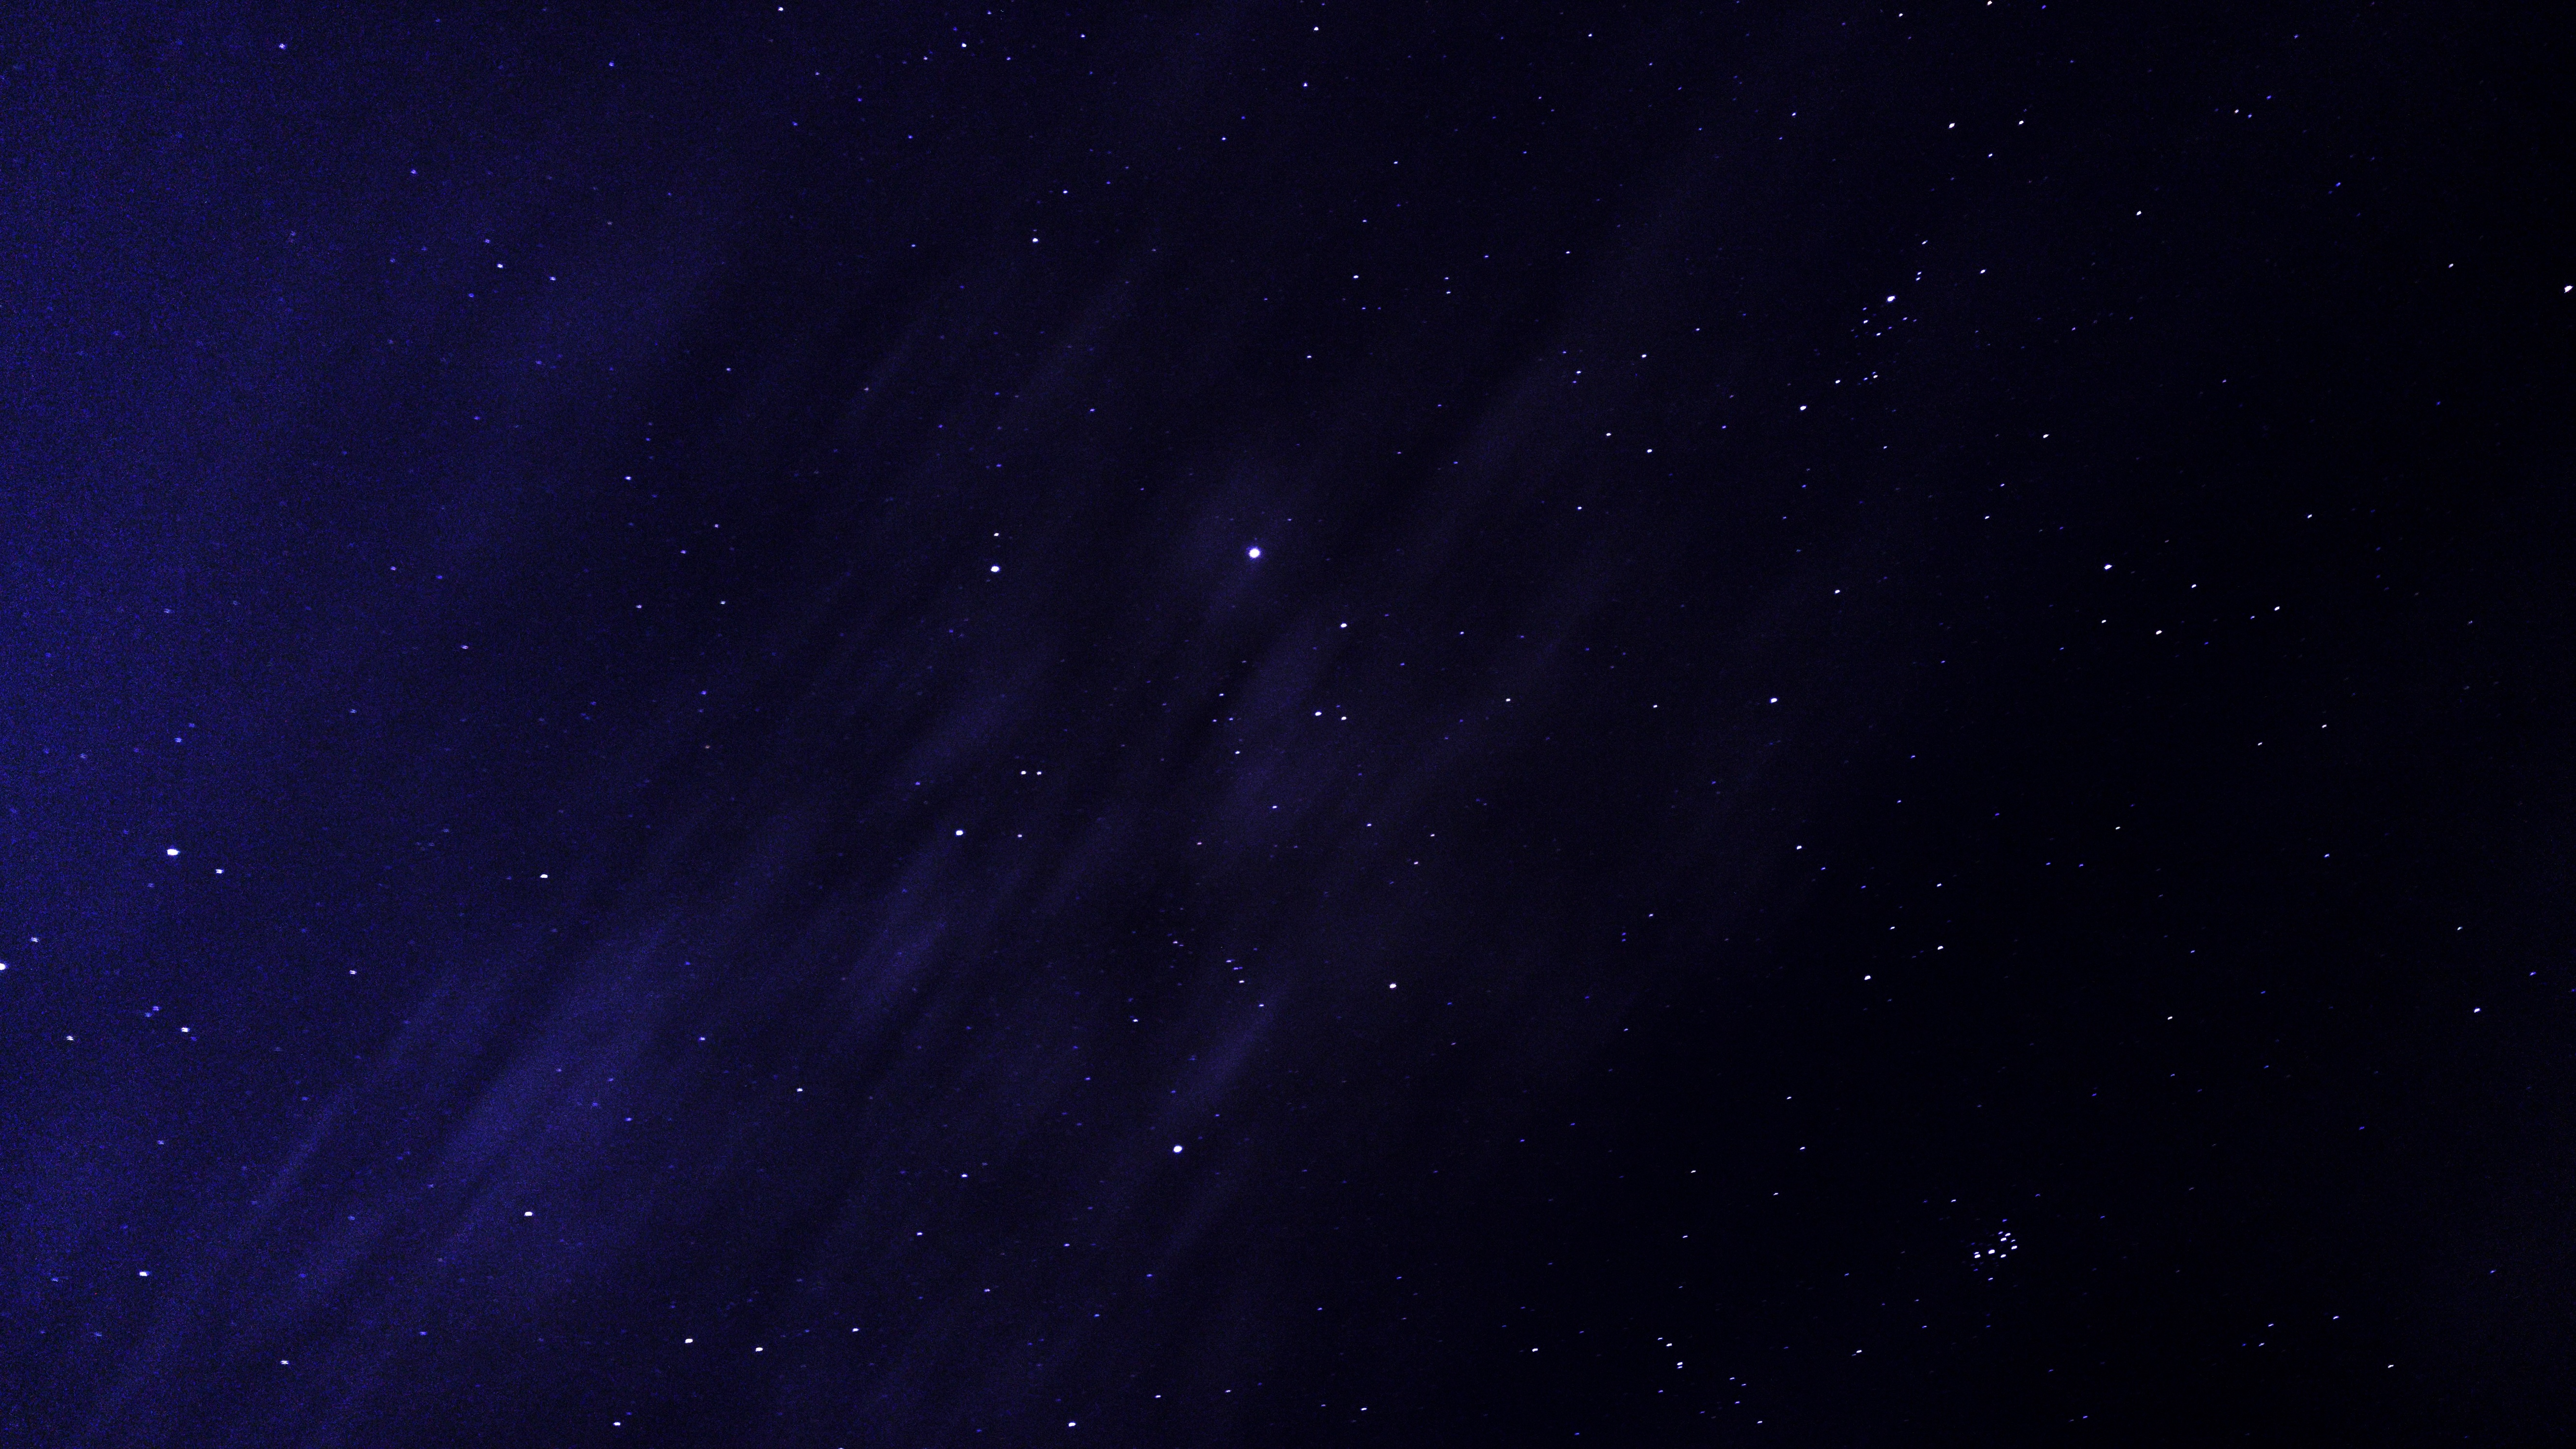 Download Die Original Wallpaper Des Samsung Galaxy S7: Starry Sky, Stars, Night, HD 4K Wallpaper